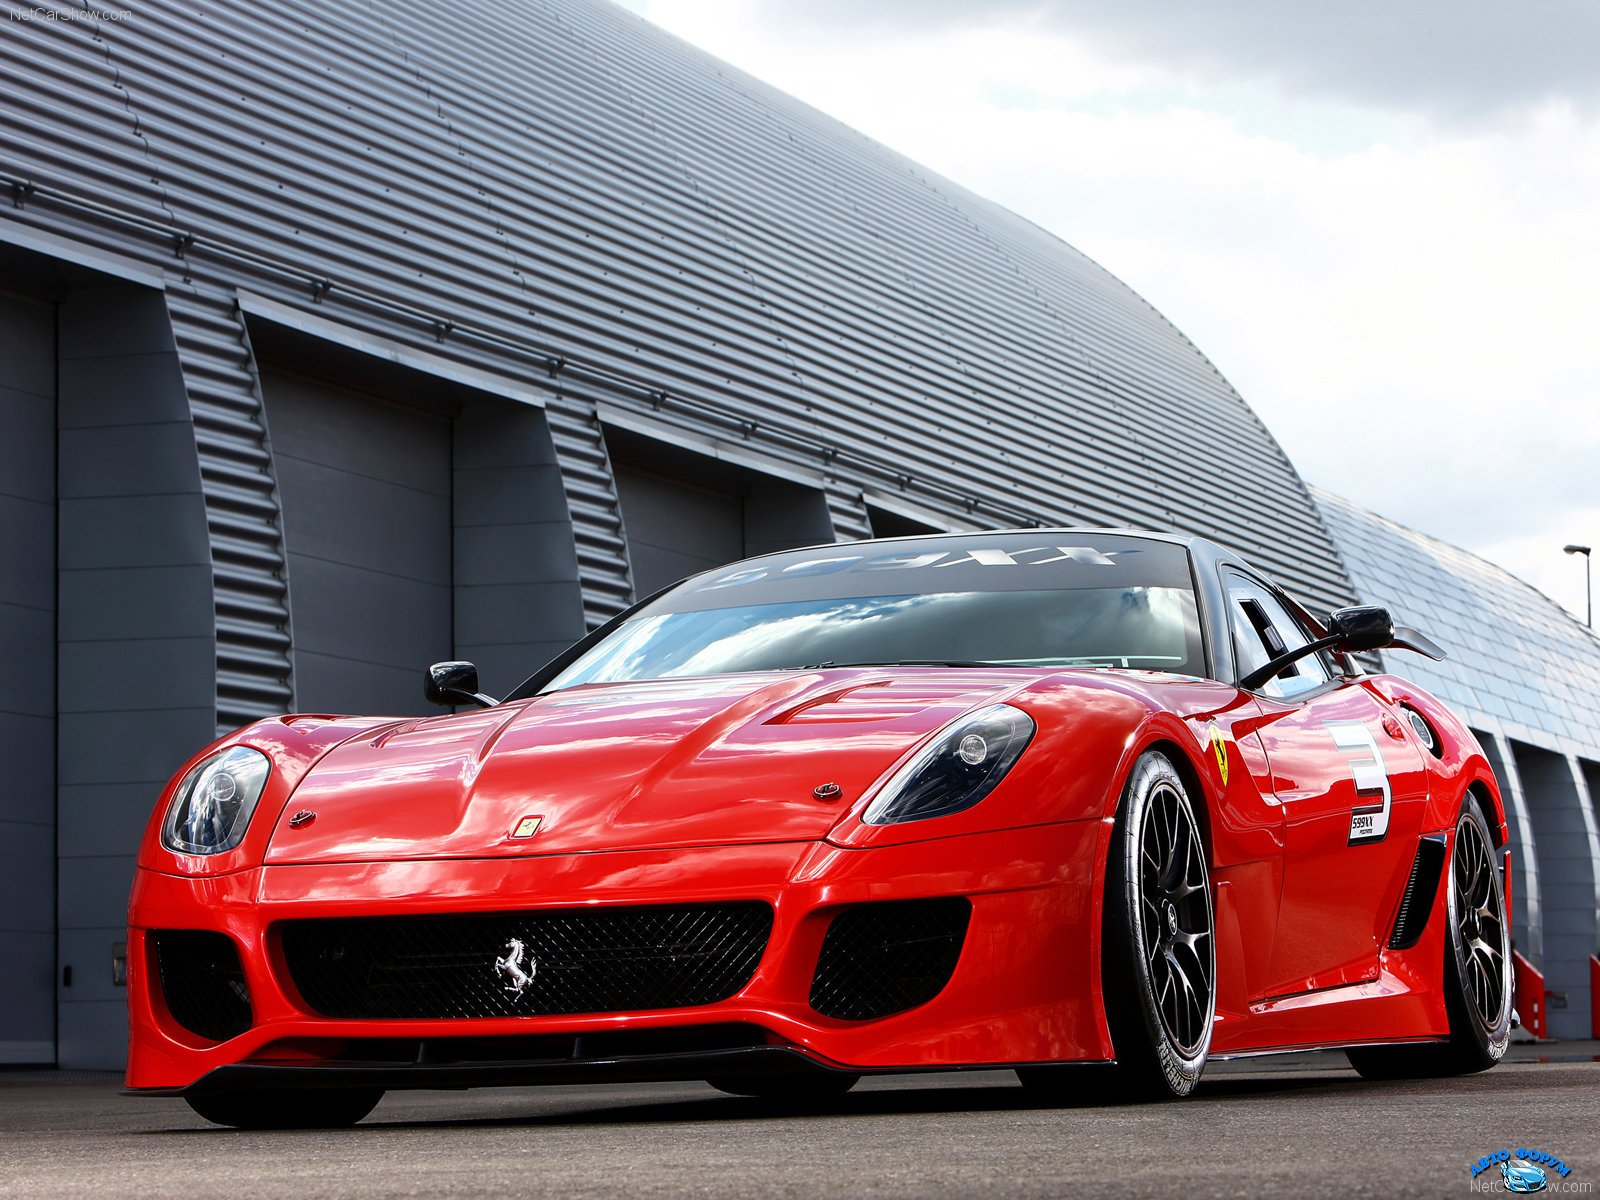 Ferrari-599XX_2010_1600x1200_wallpaper_01.jpg